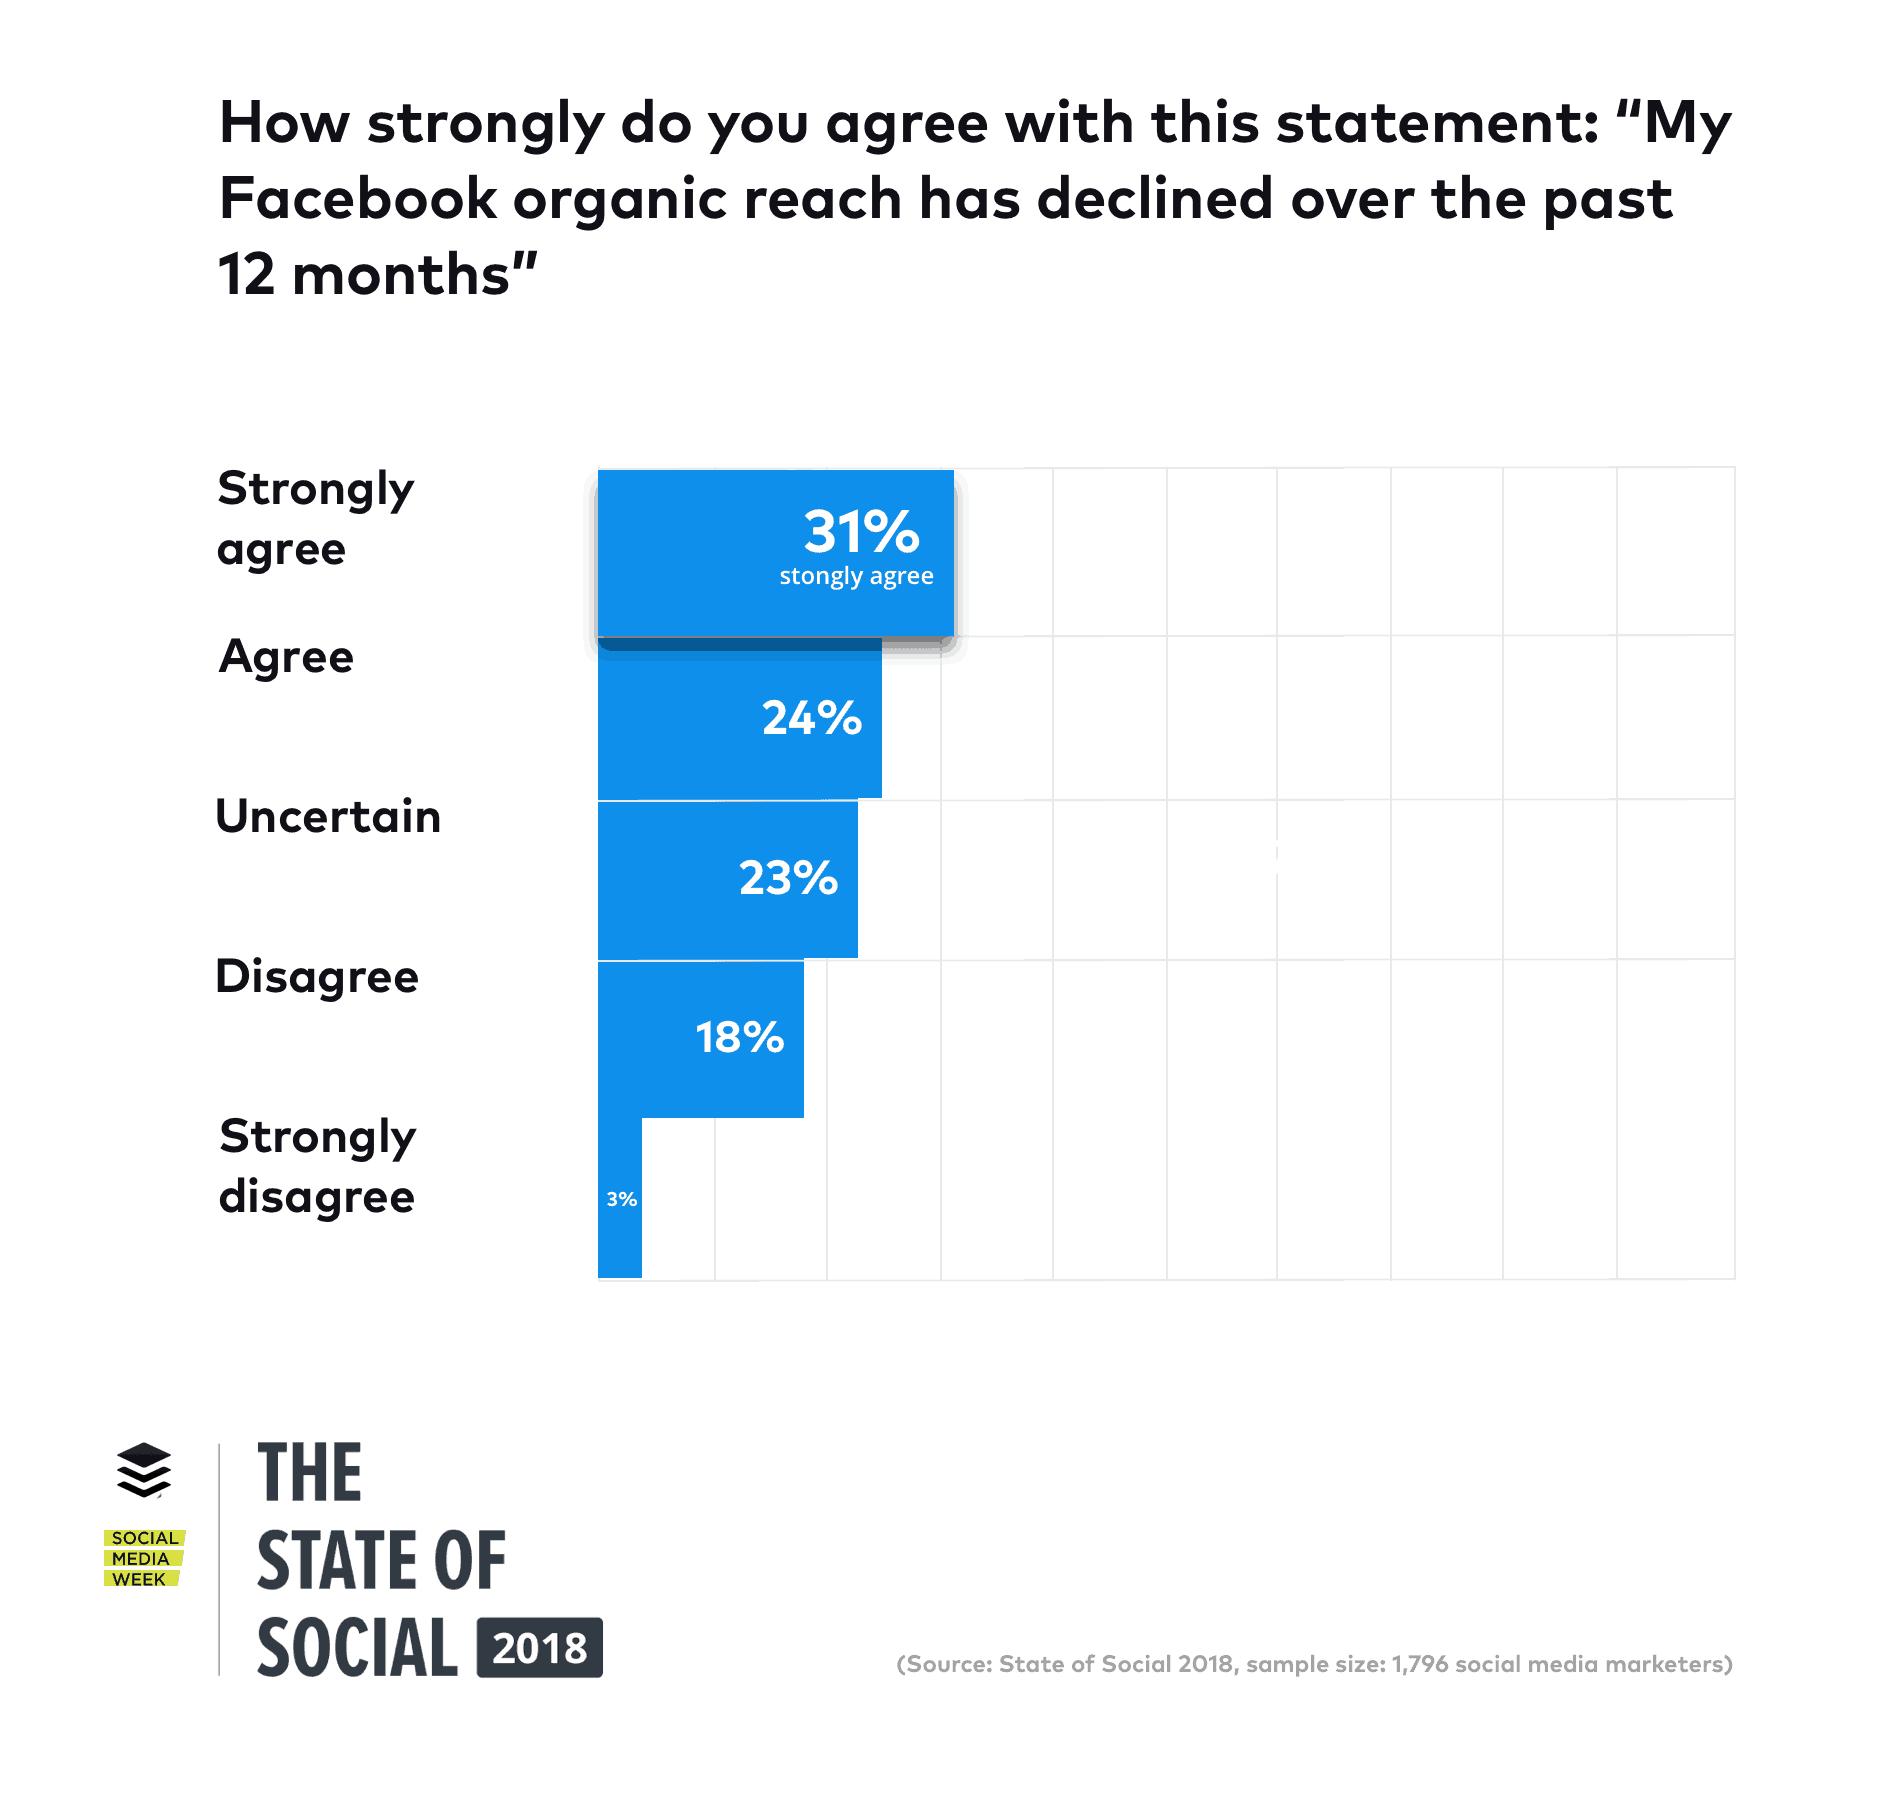 State of Social 2018 Facebook Organic Reach